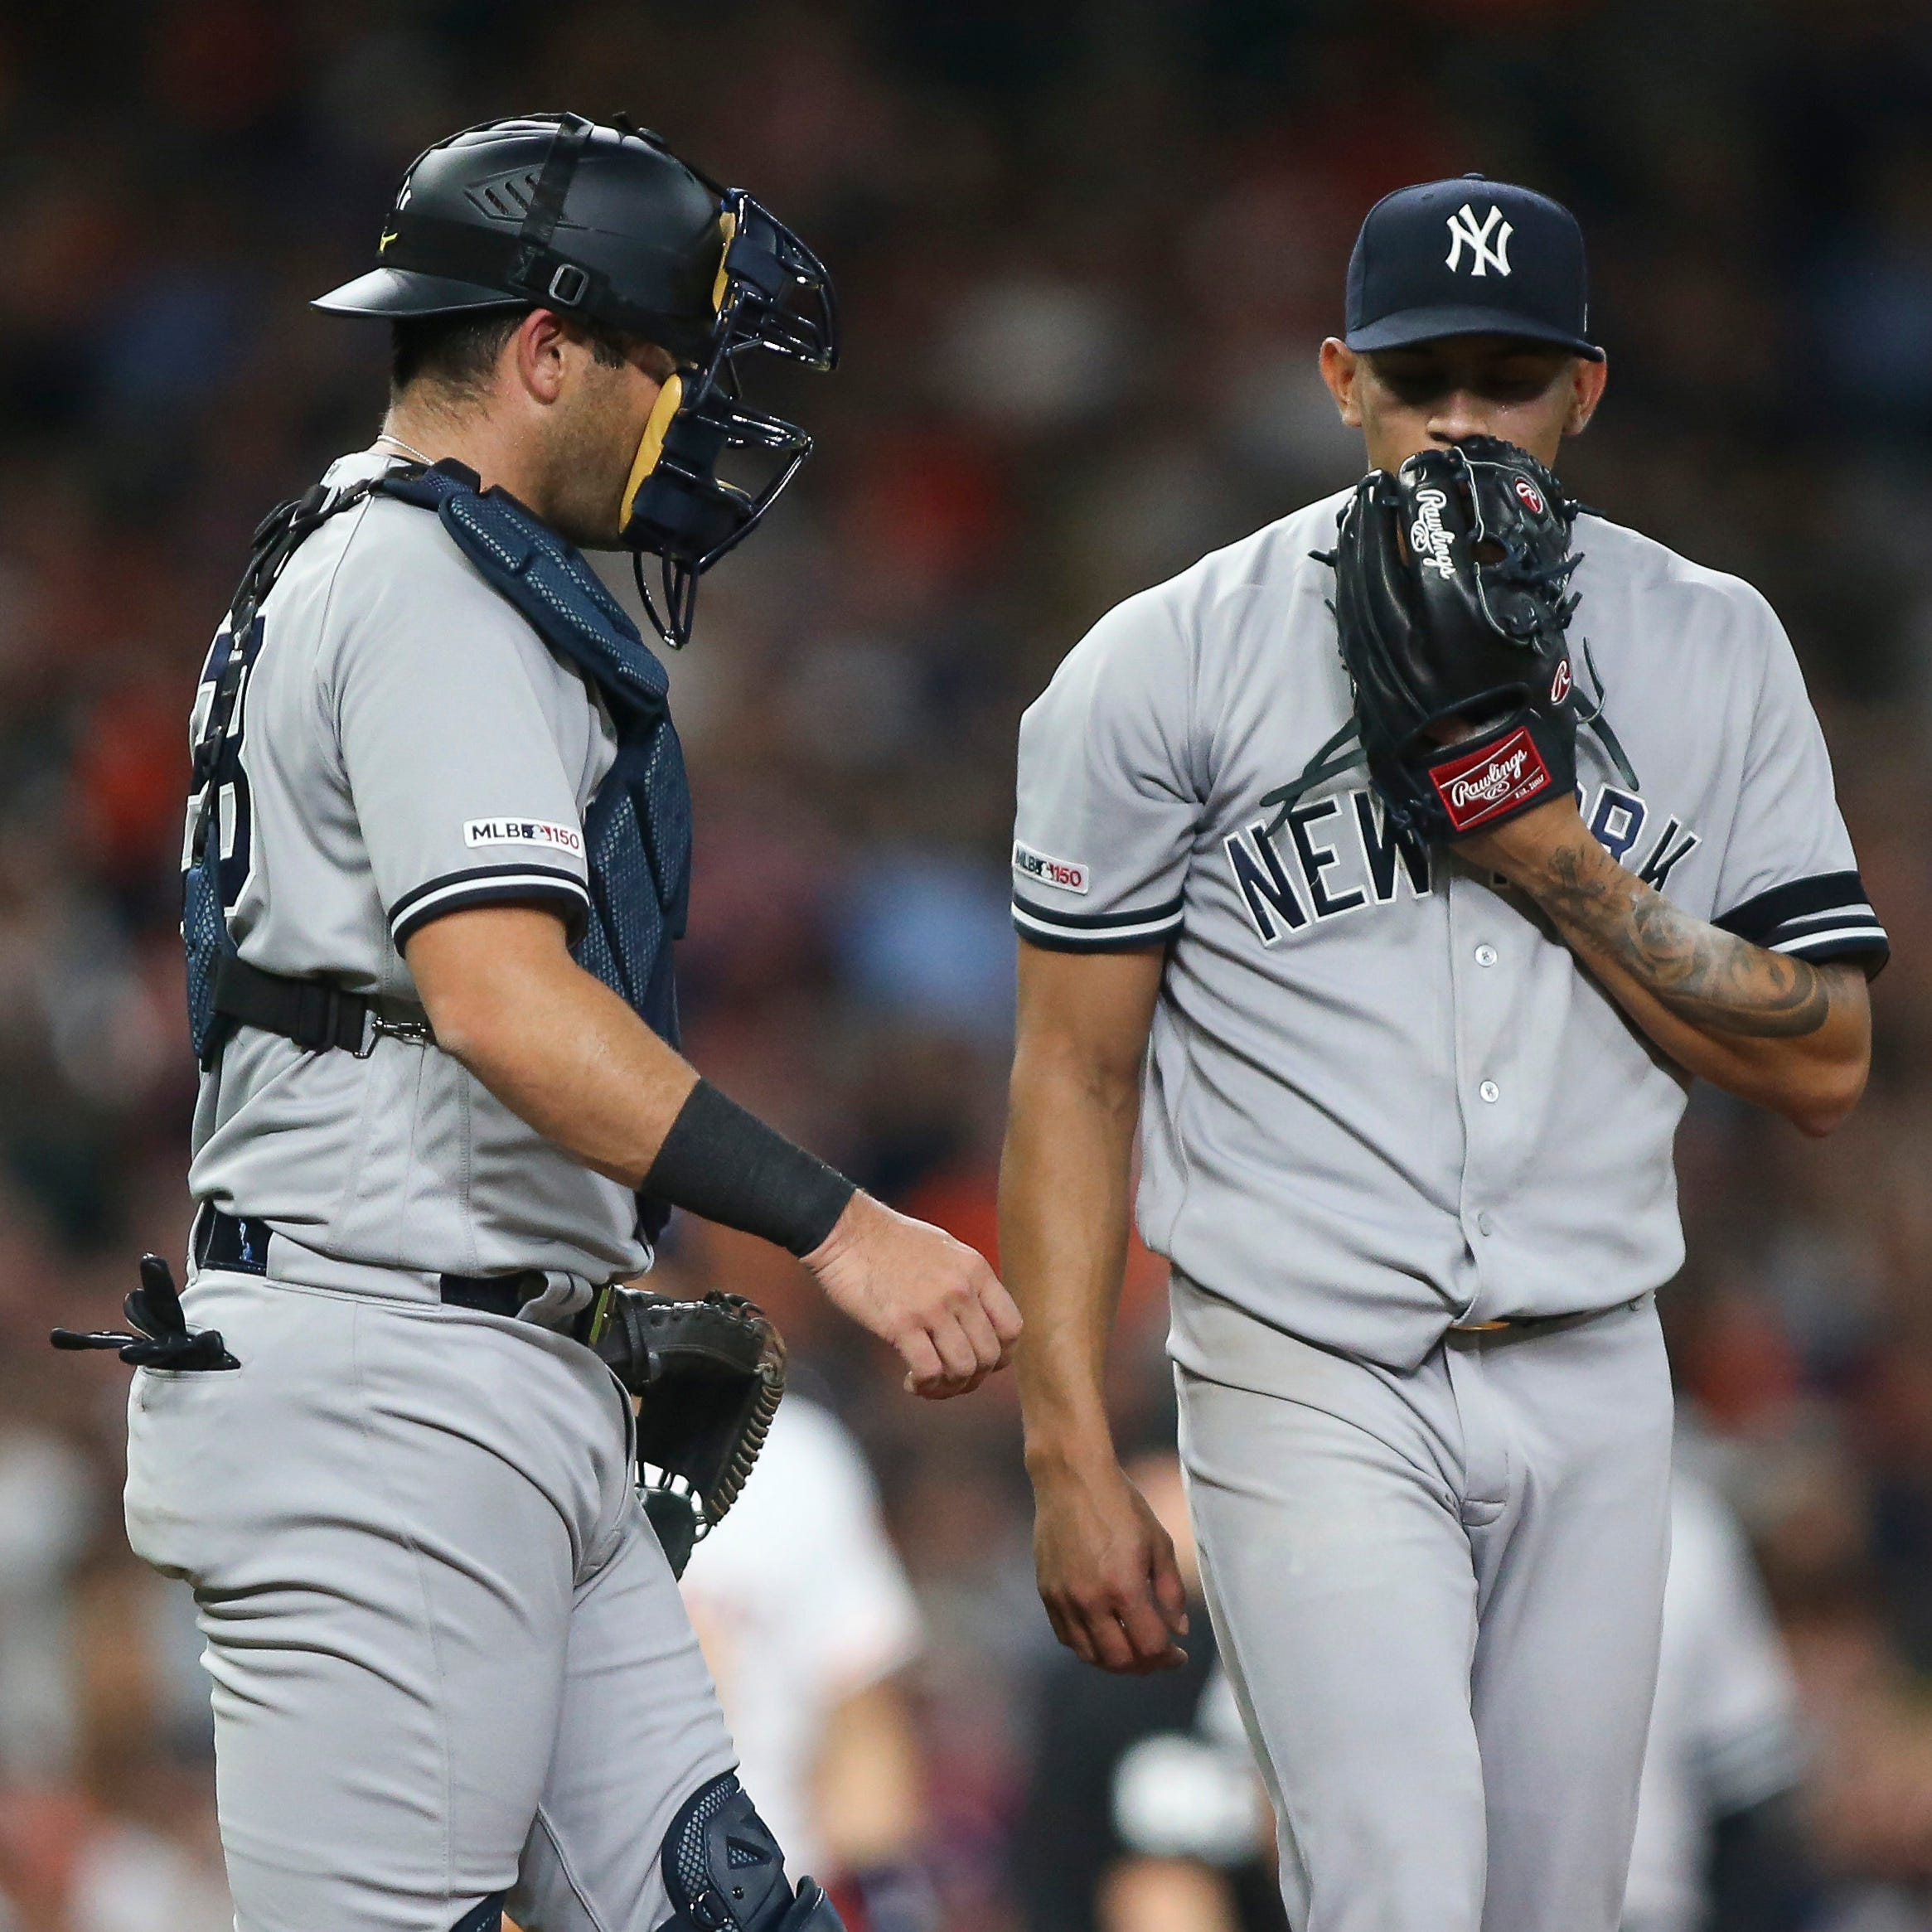 New York Yankees option Jonathan Loaisiga, call up Joe Harvey